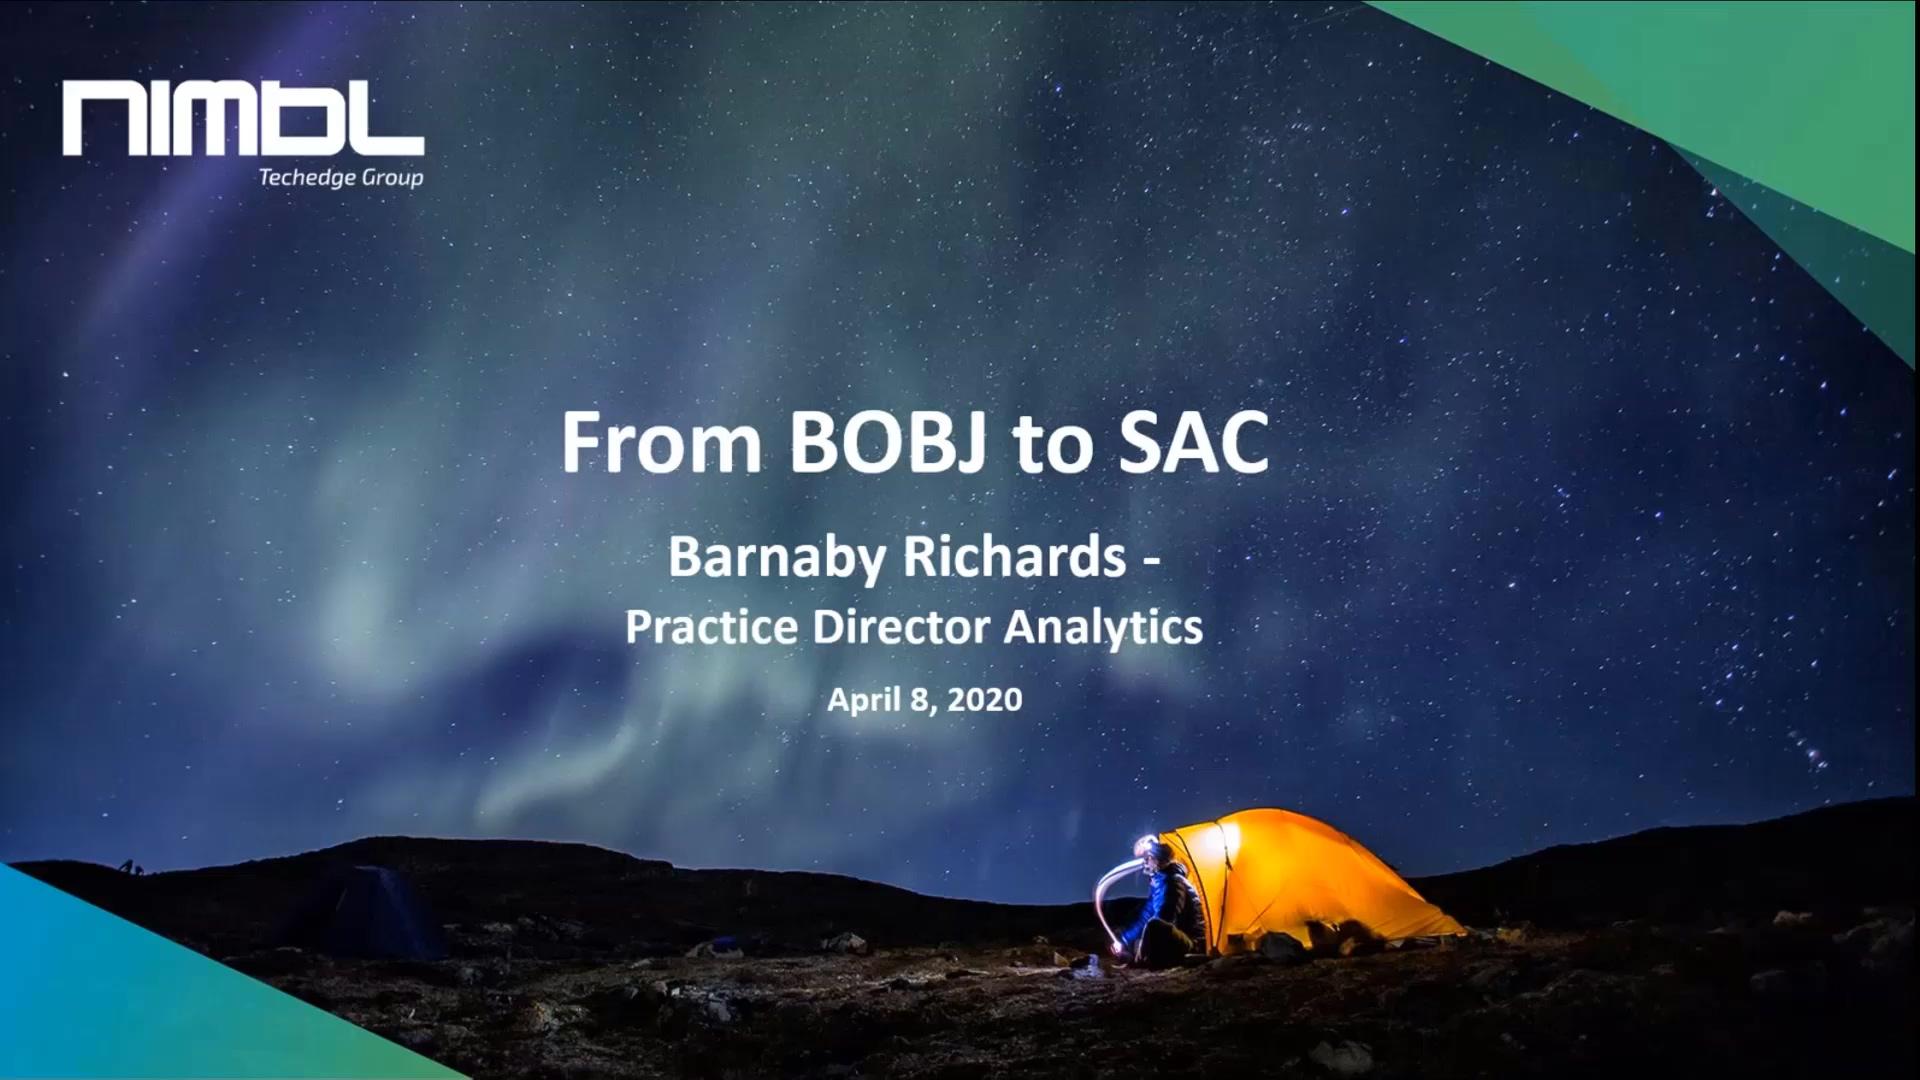 Updated - No Intro - BOBJ to SAC